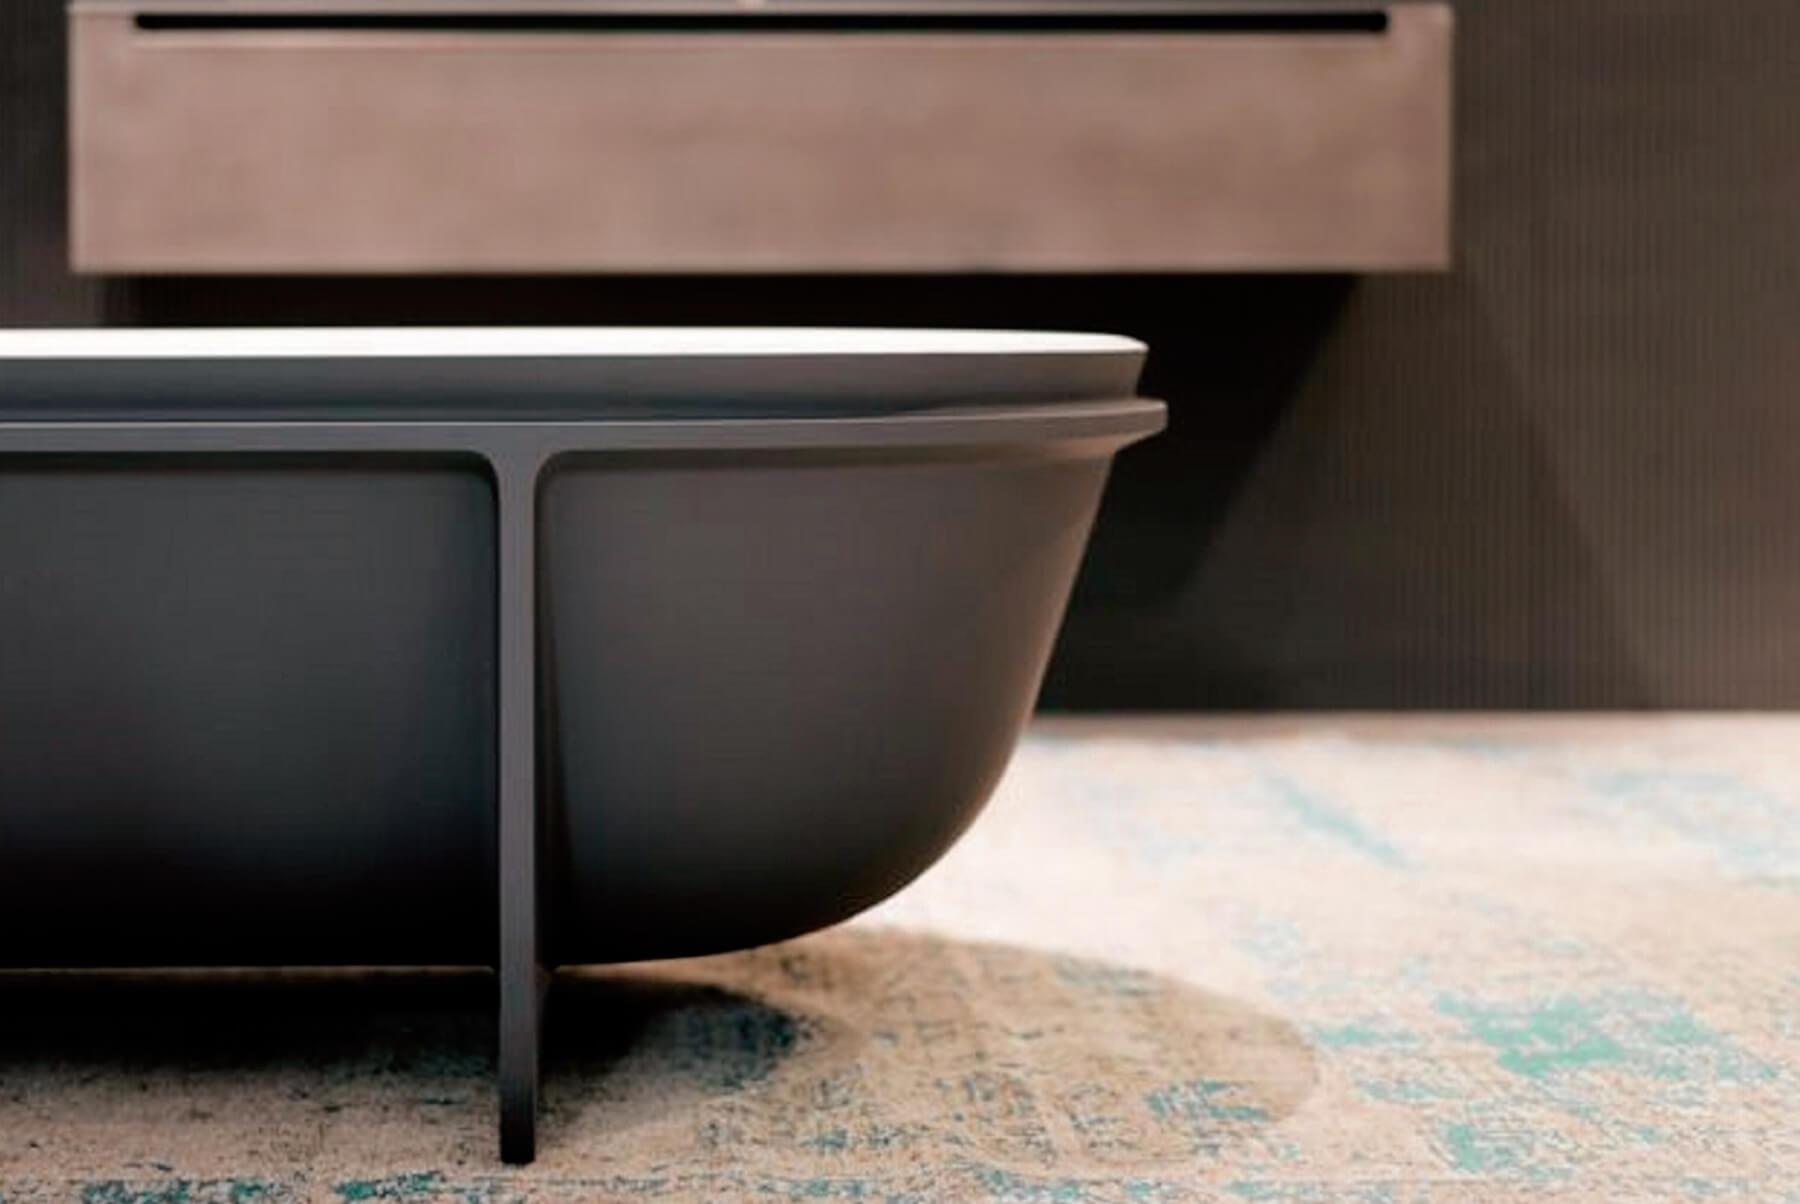 Bath-Tubs-Falper-Controstampo-grey-detail-1800x1204